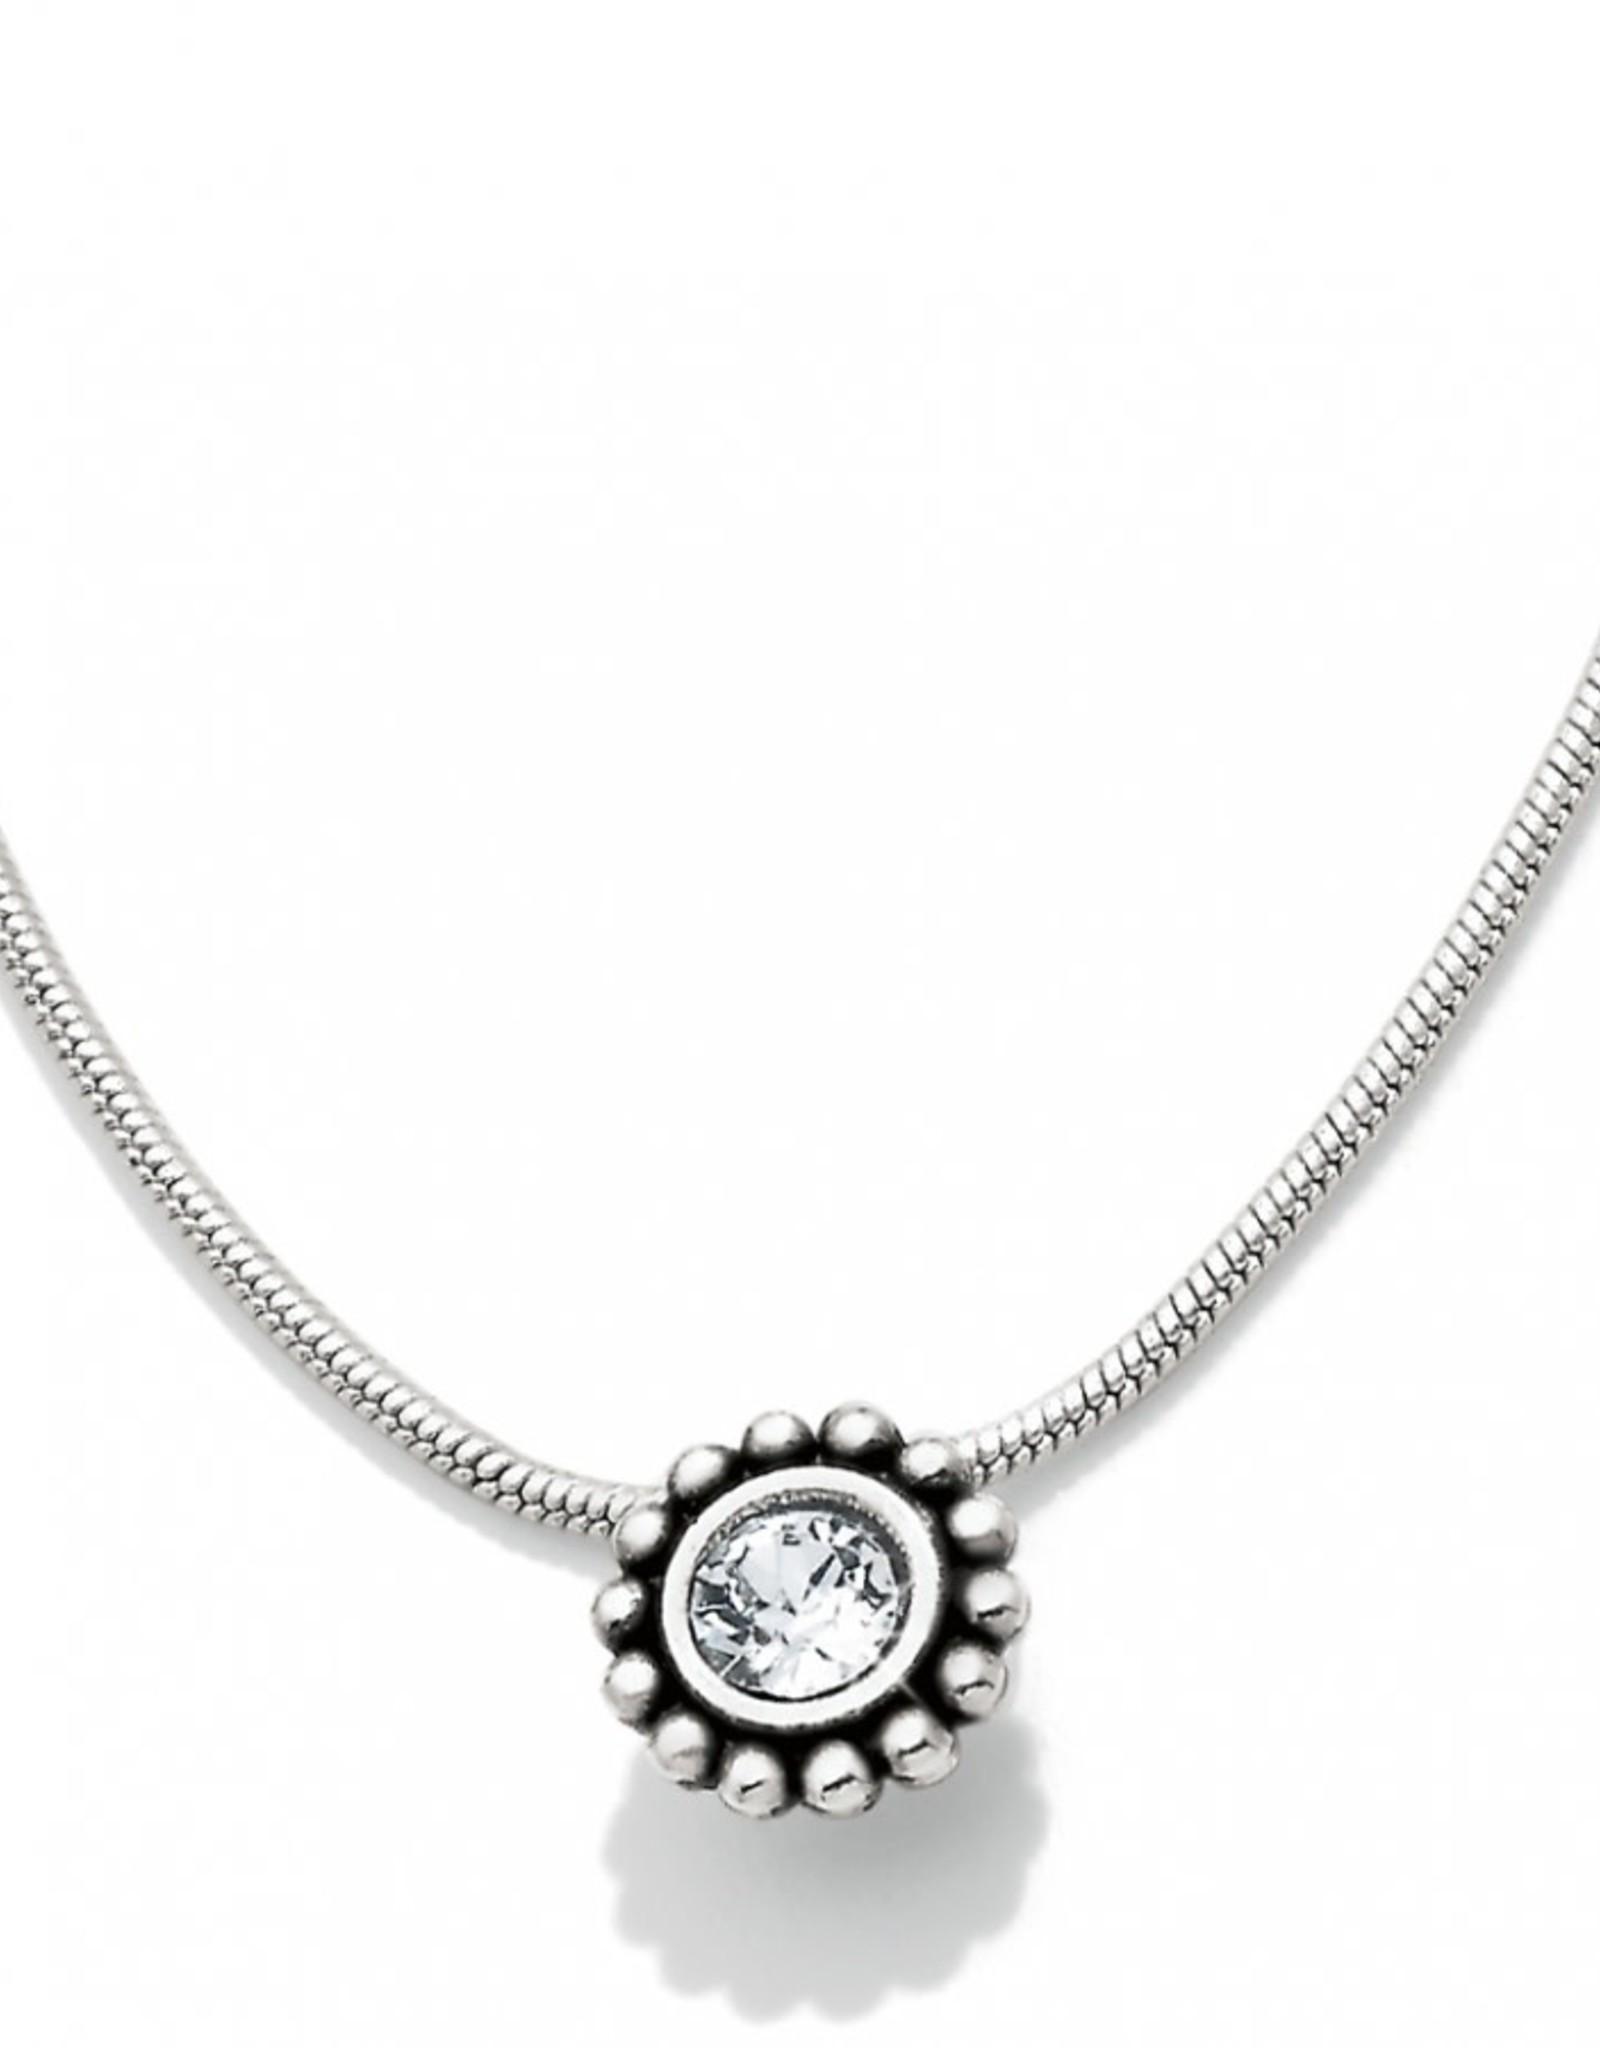 Brighton Brighton Necklace Twinkle Round Petite